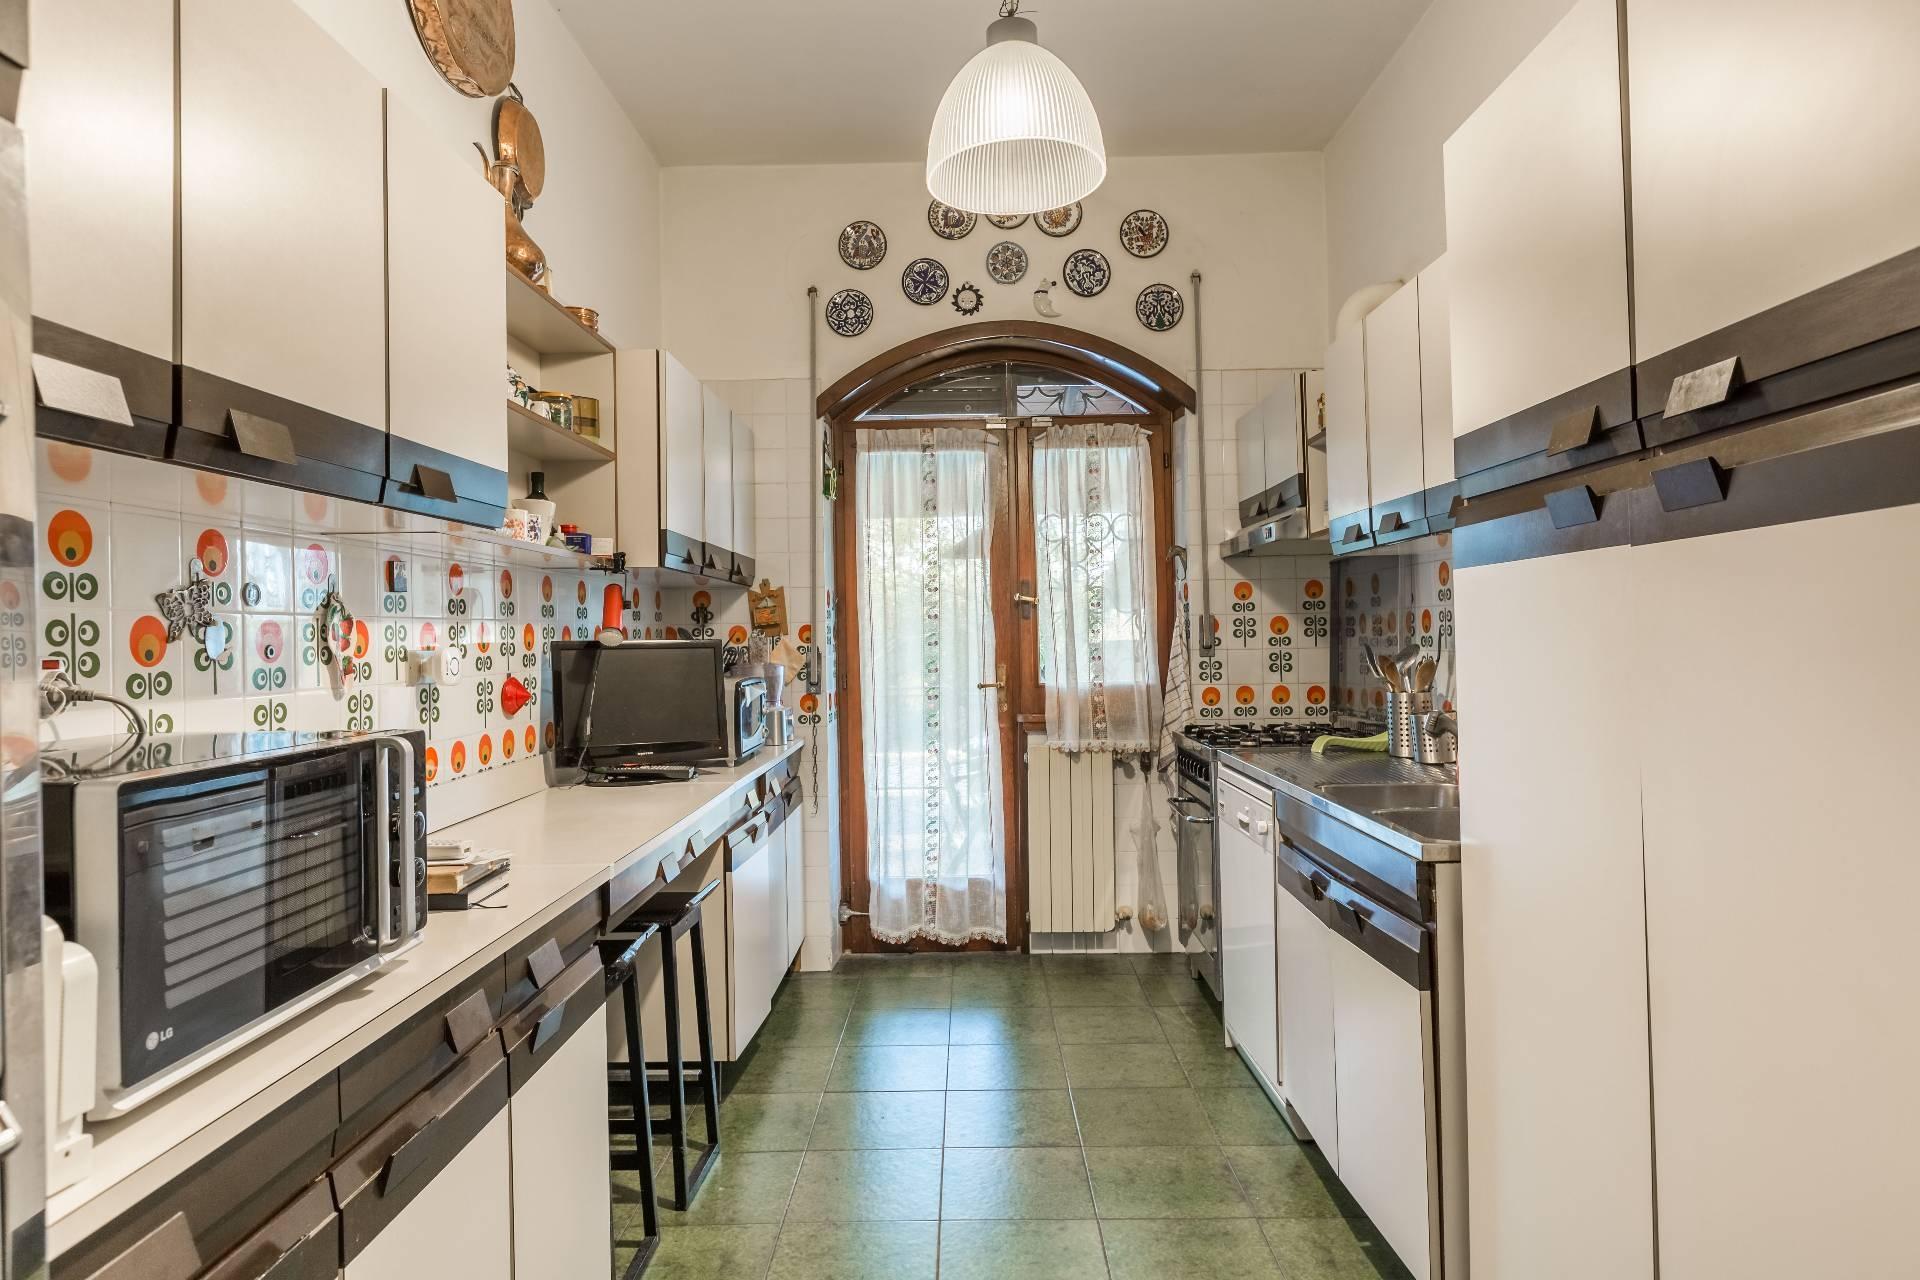 Cbi072 ex913 casa indipendente in vendita a roma for Cucina a bovindo